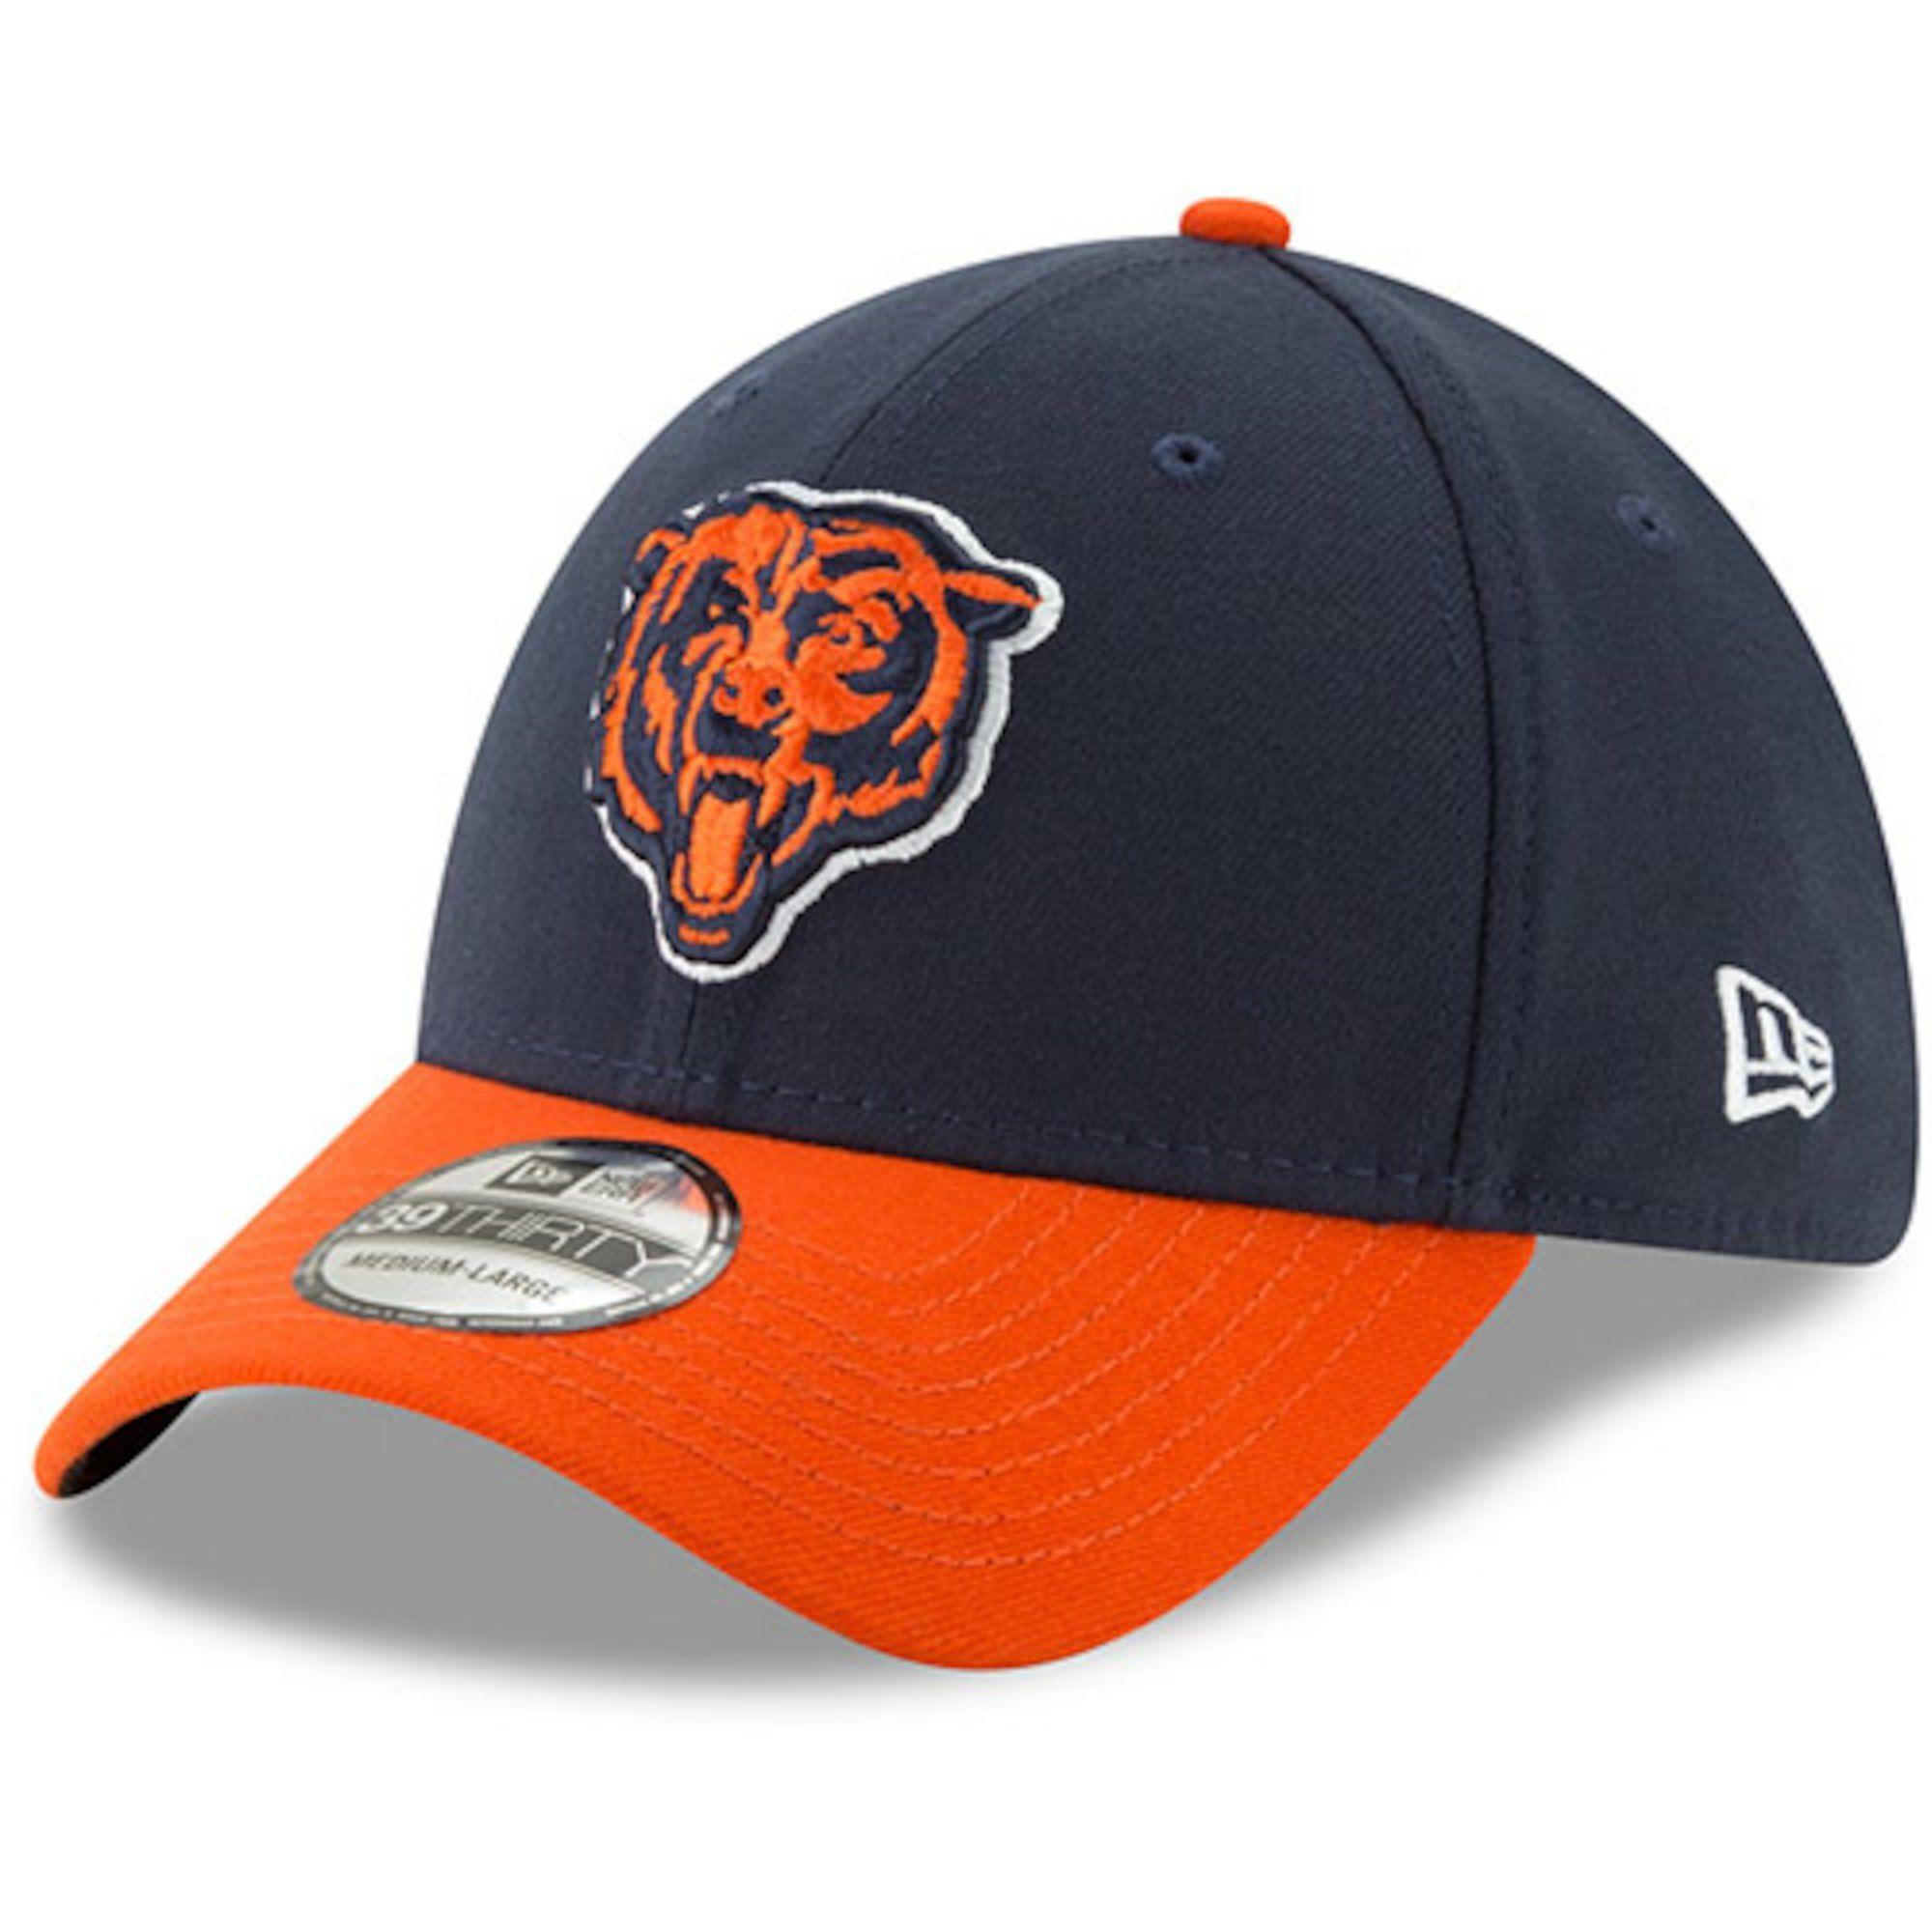 66d4b21ed9f Men s Chicago Bears New Era Navy Orange Team Classic Two-Tone 39THIRTY Flex  Hat